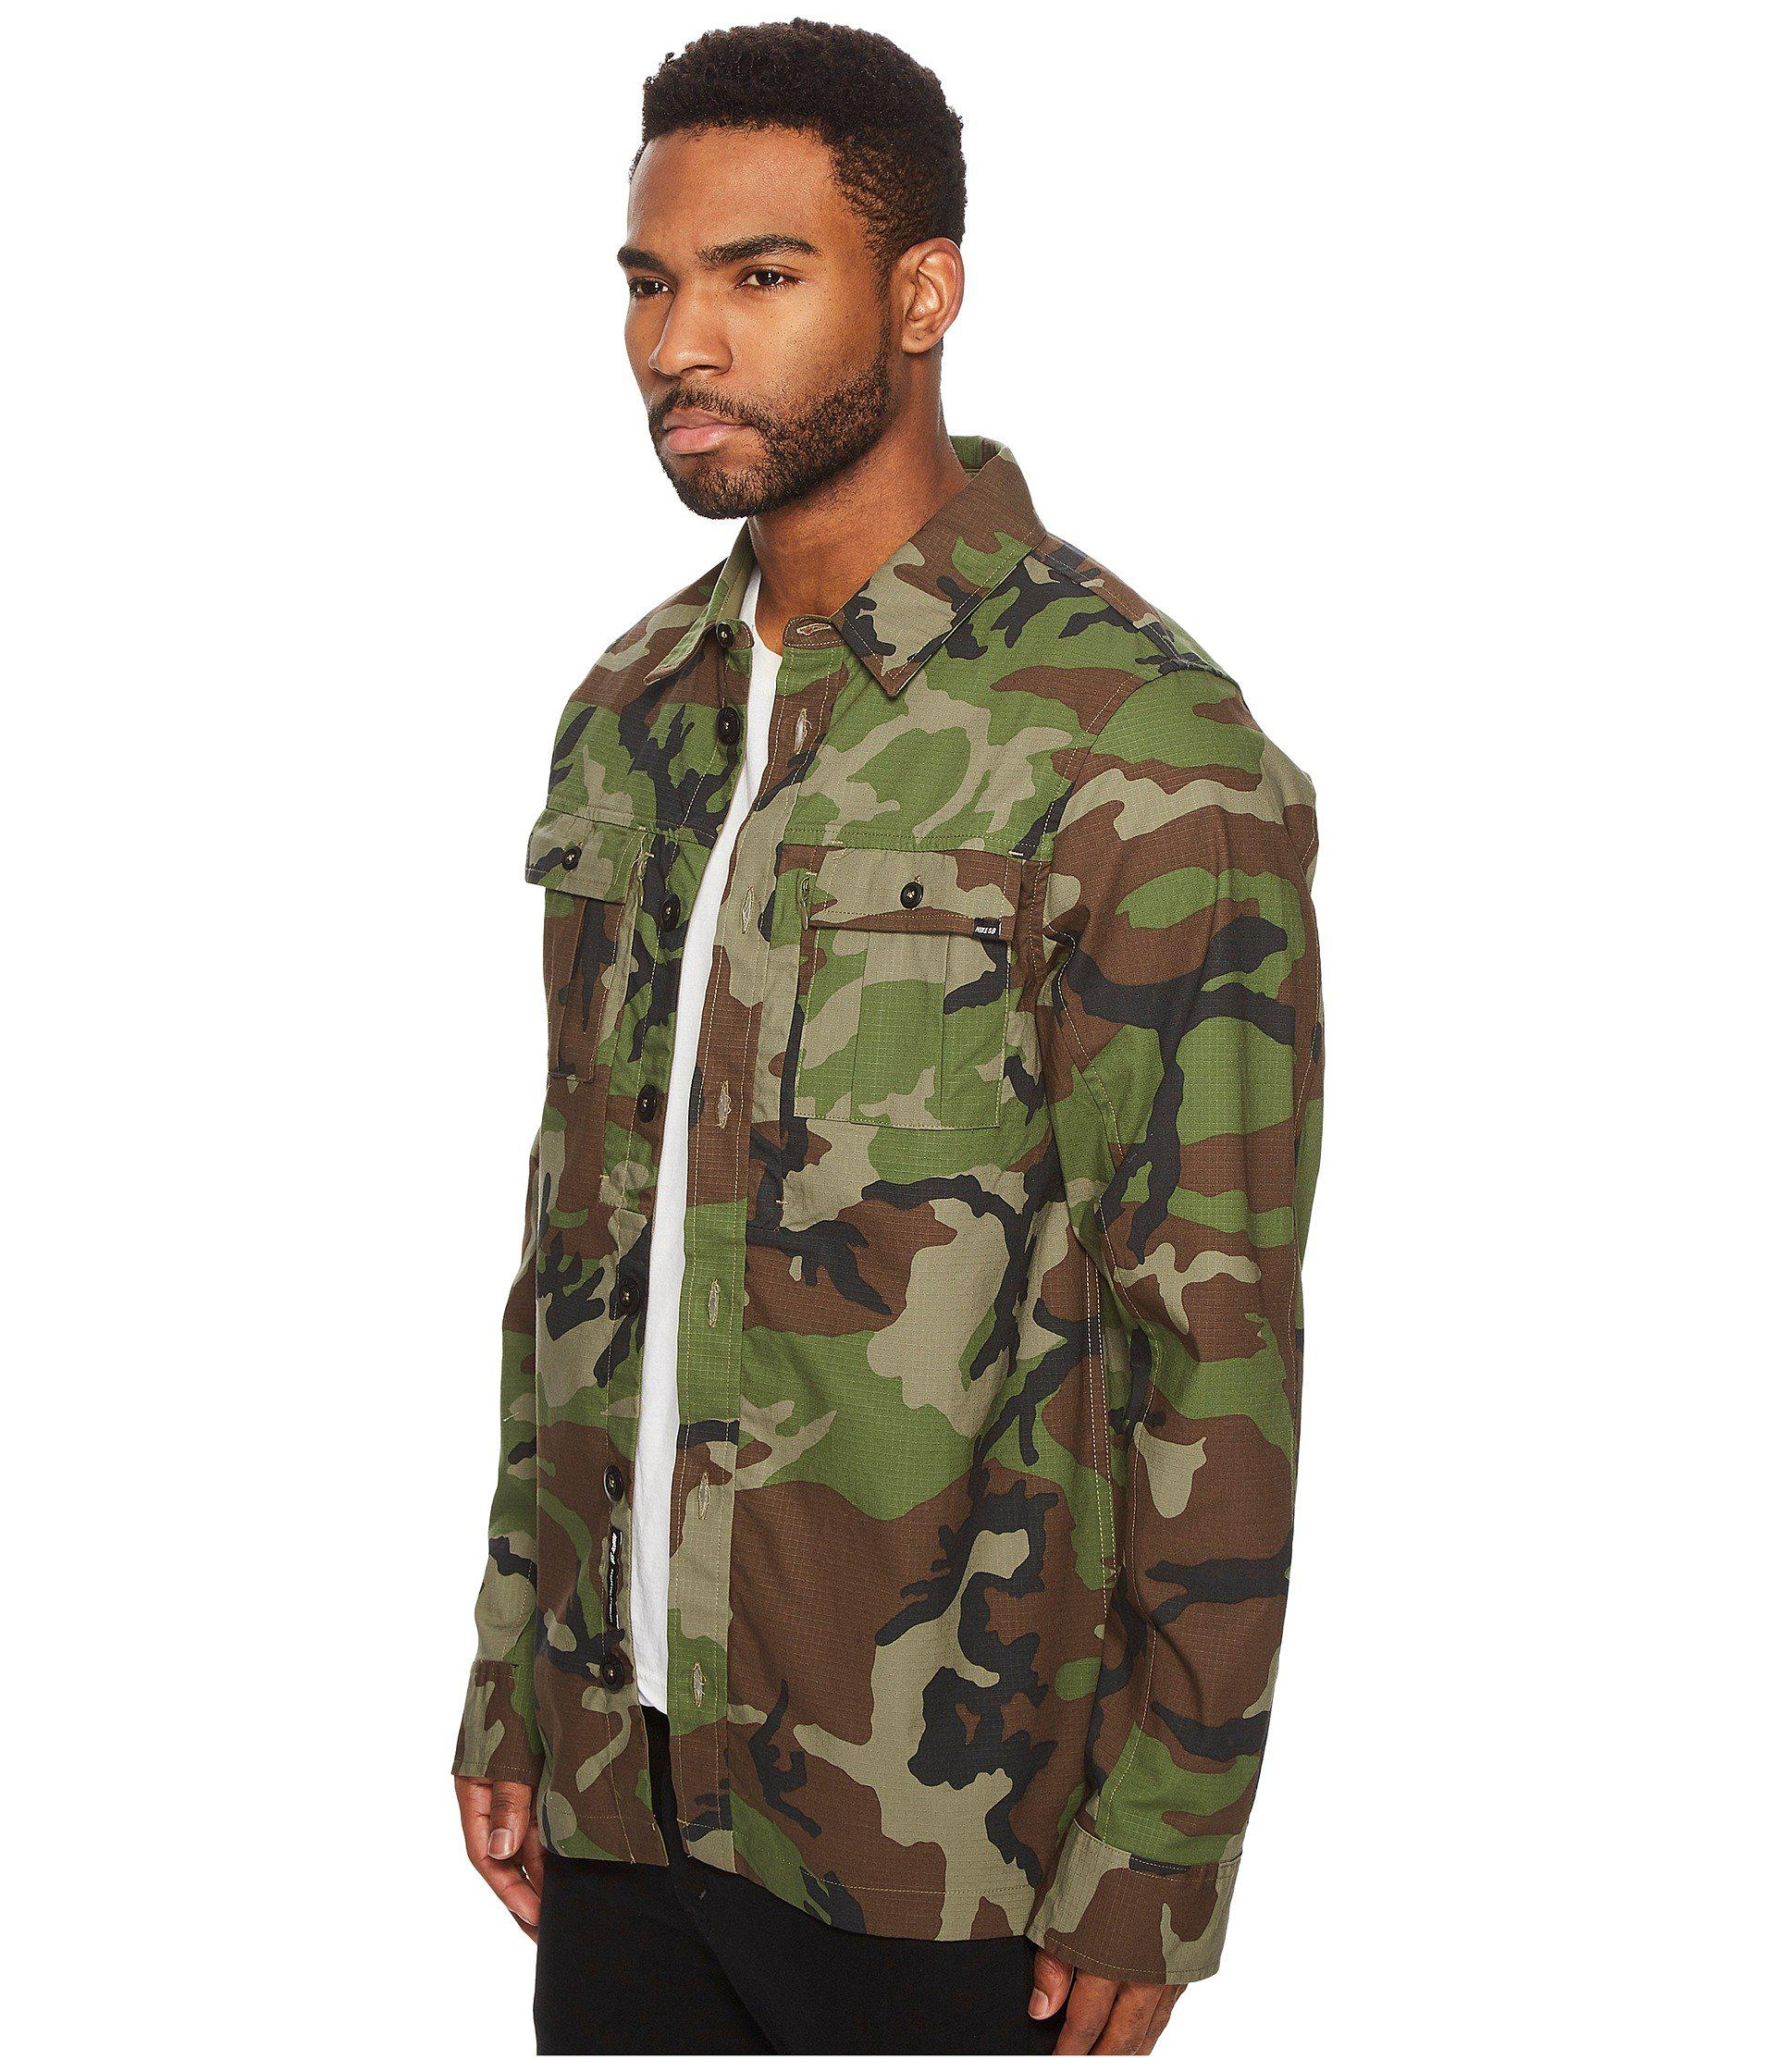 f22e6124765bf Lyst - Nike Sb Flex Holgate Long Sleeve Camo Top in Green for Men